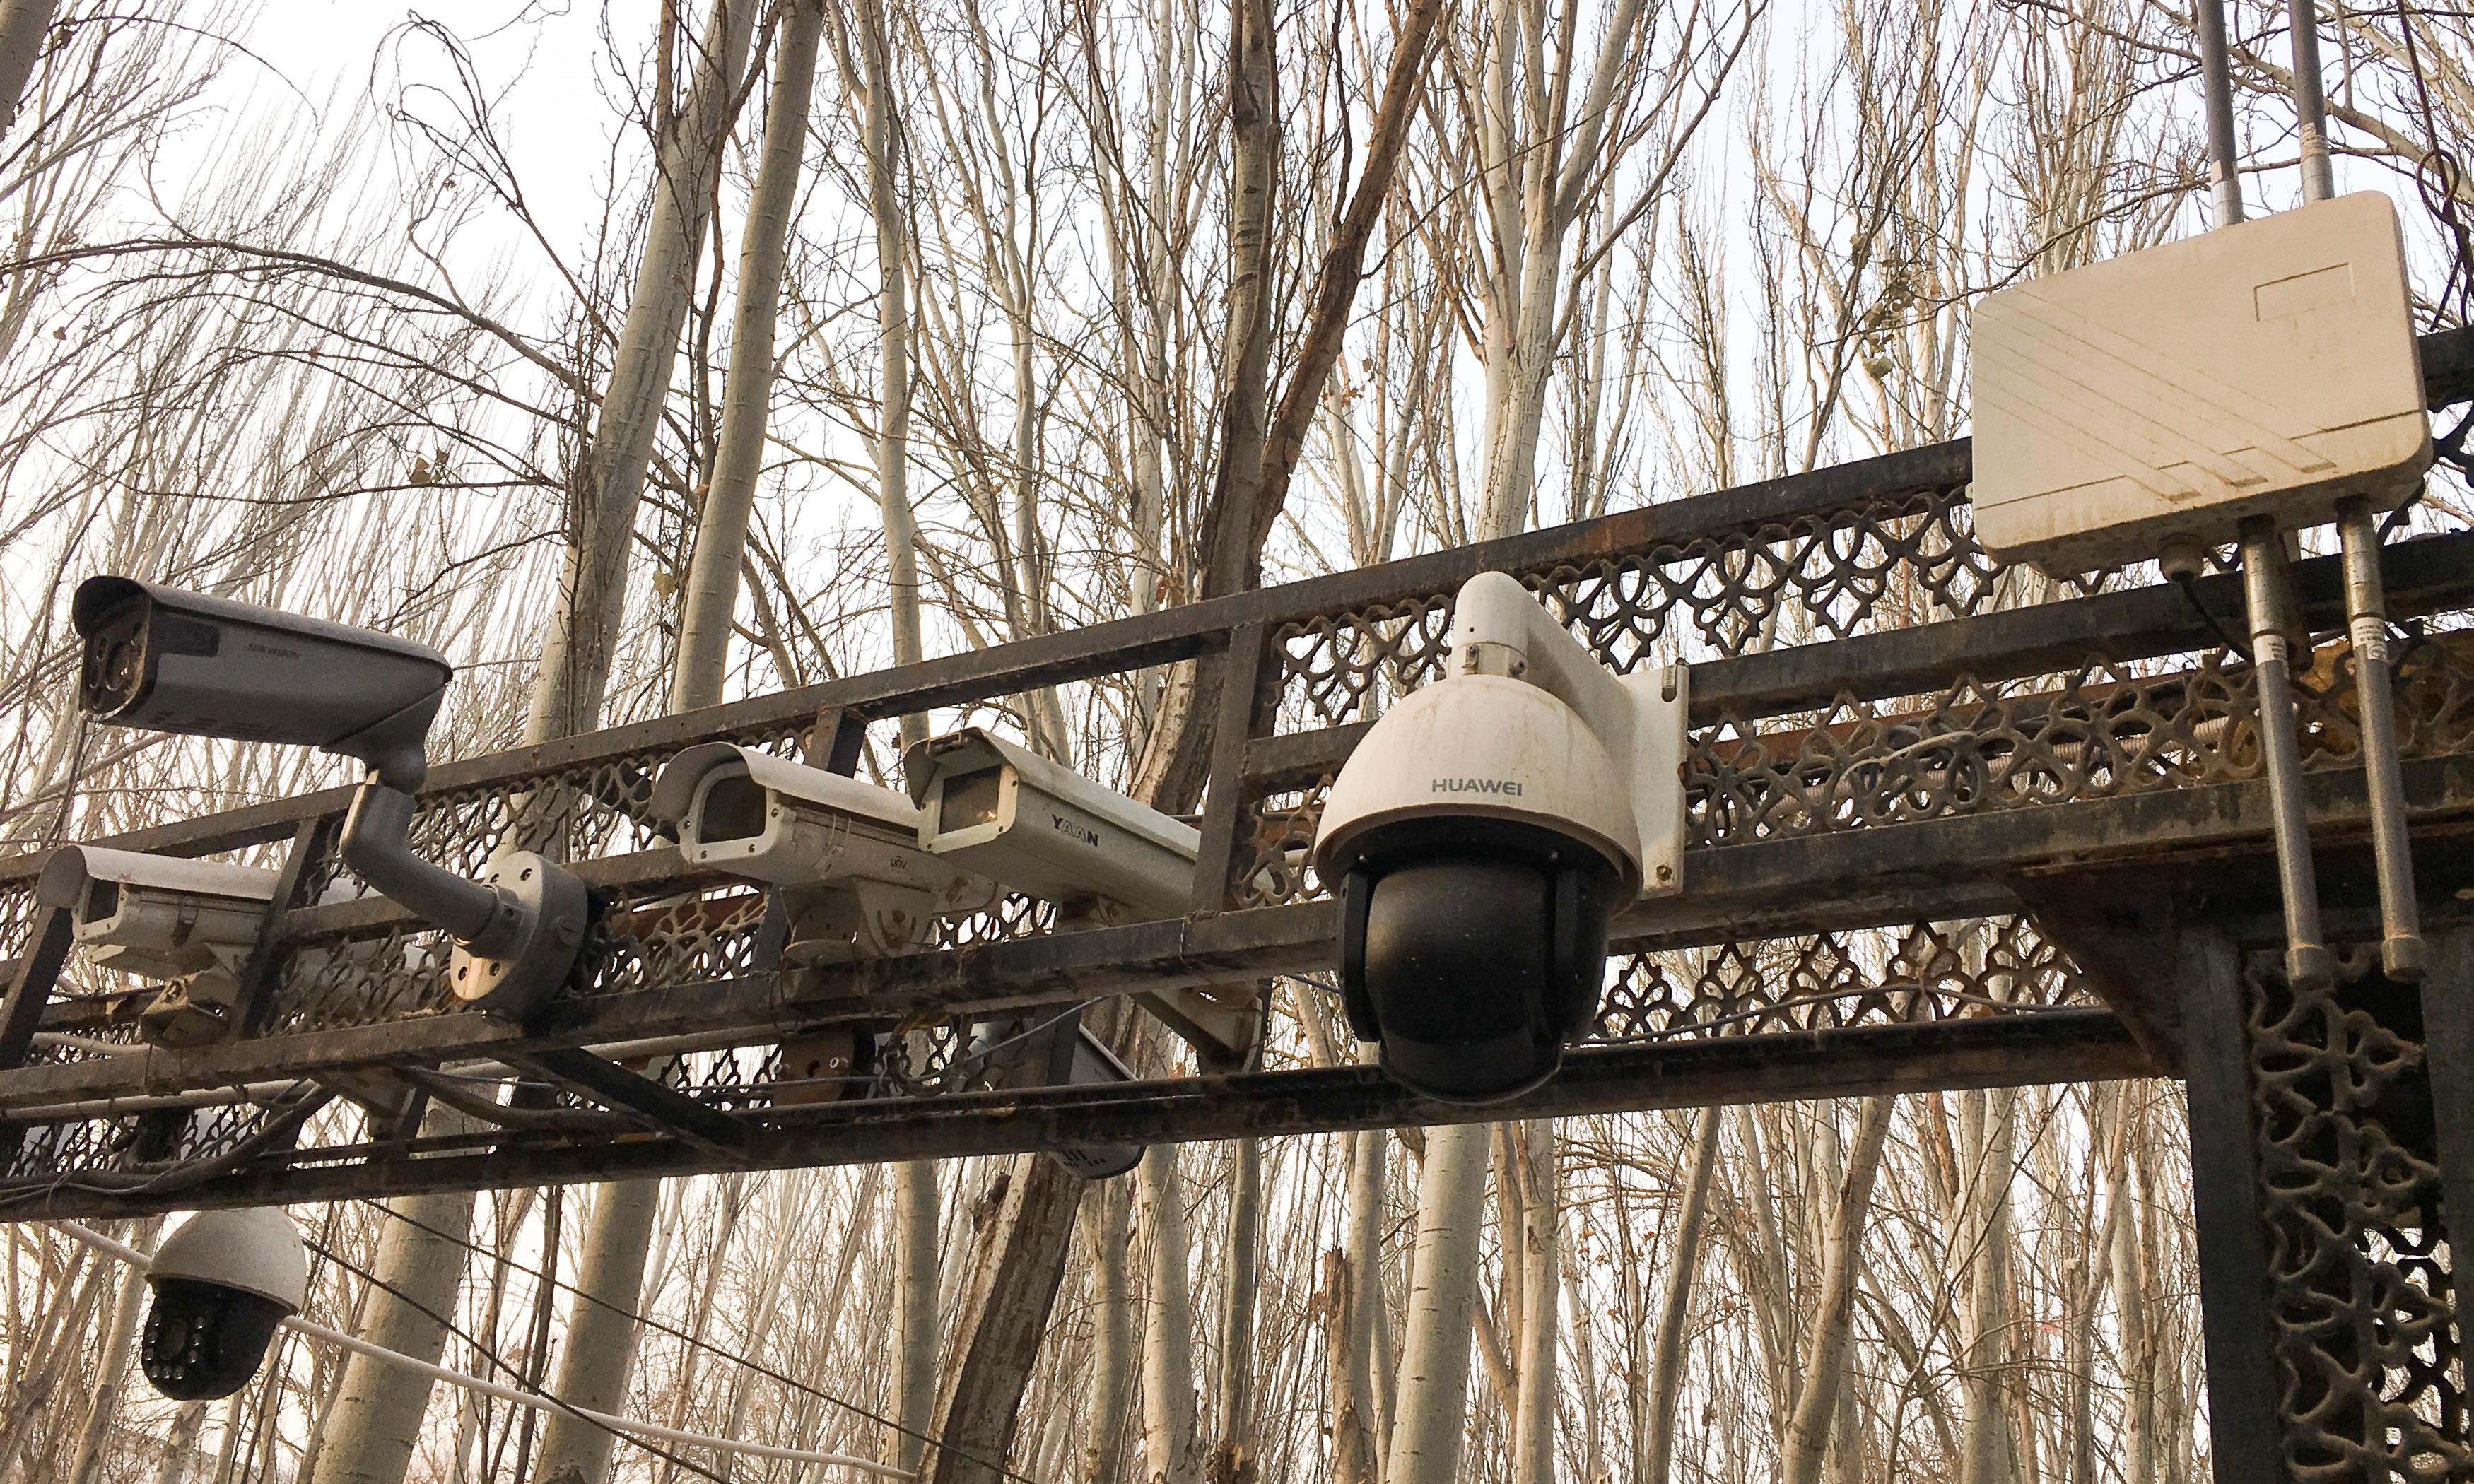 Chinese surveillance company tracking 2.5m Xinjiang residents